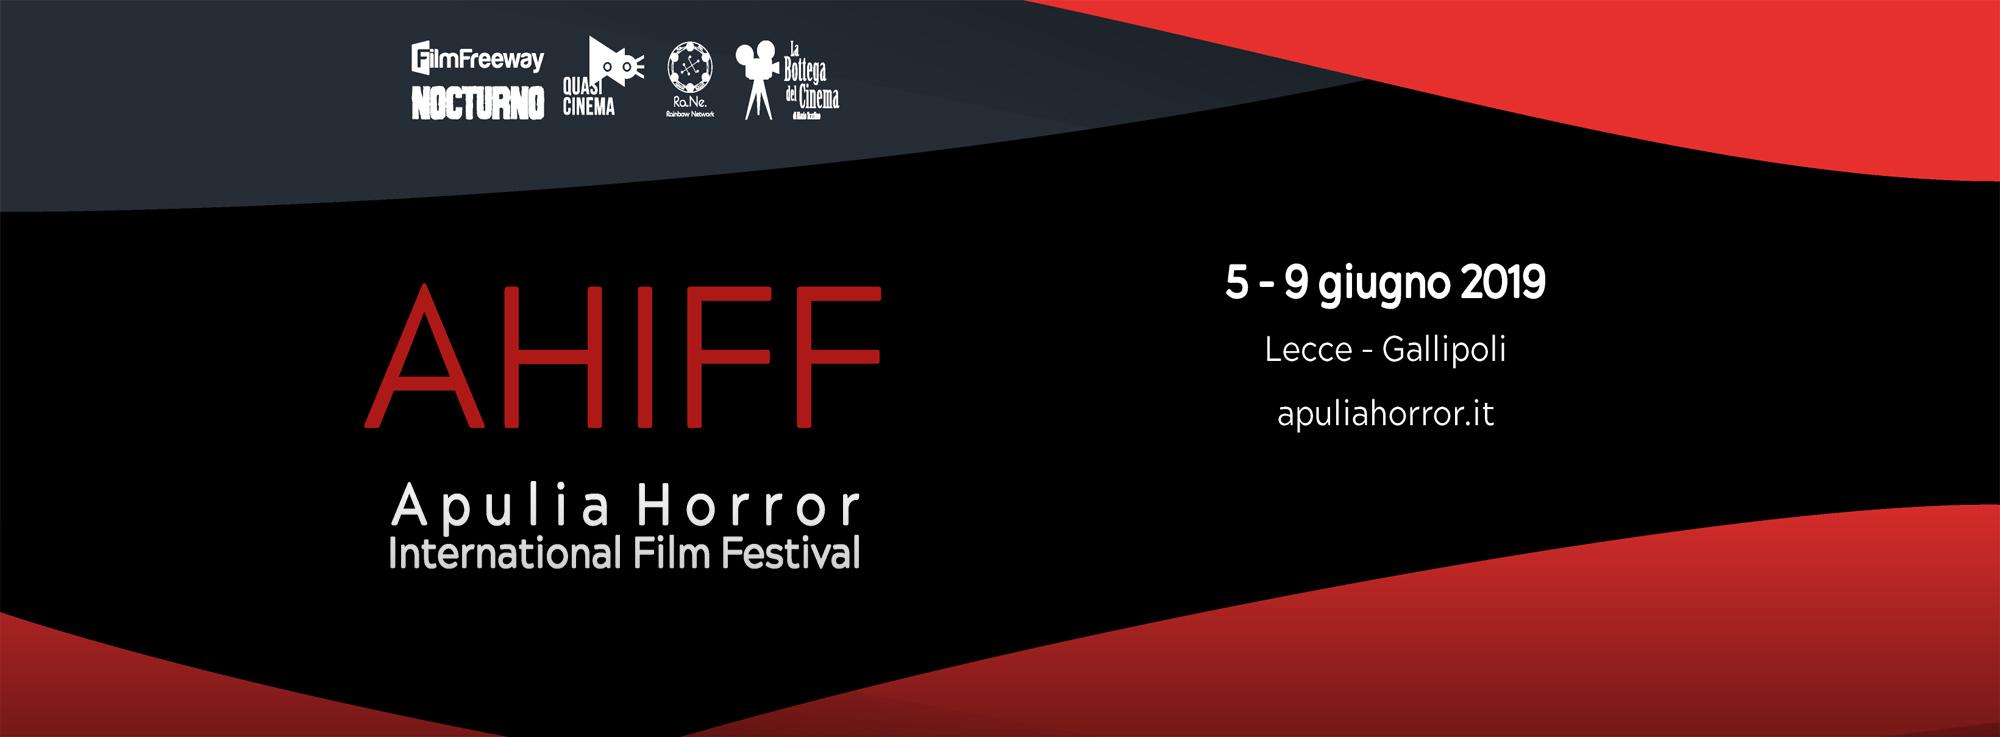 Lecce, Gallipoli: Apulia Horror International Film Festival